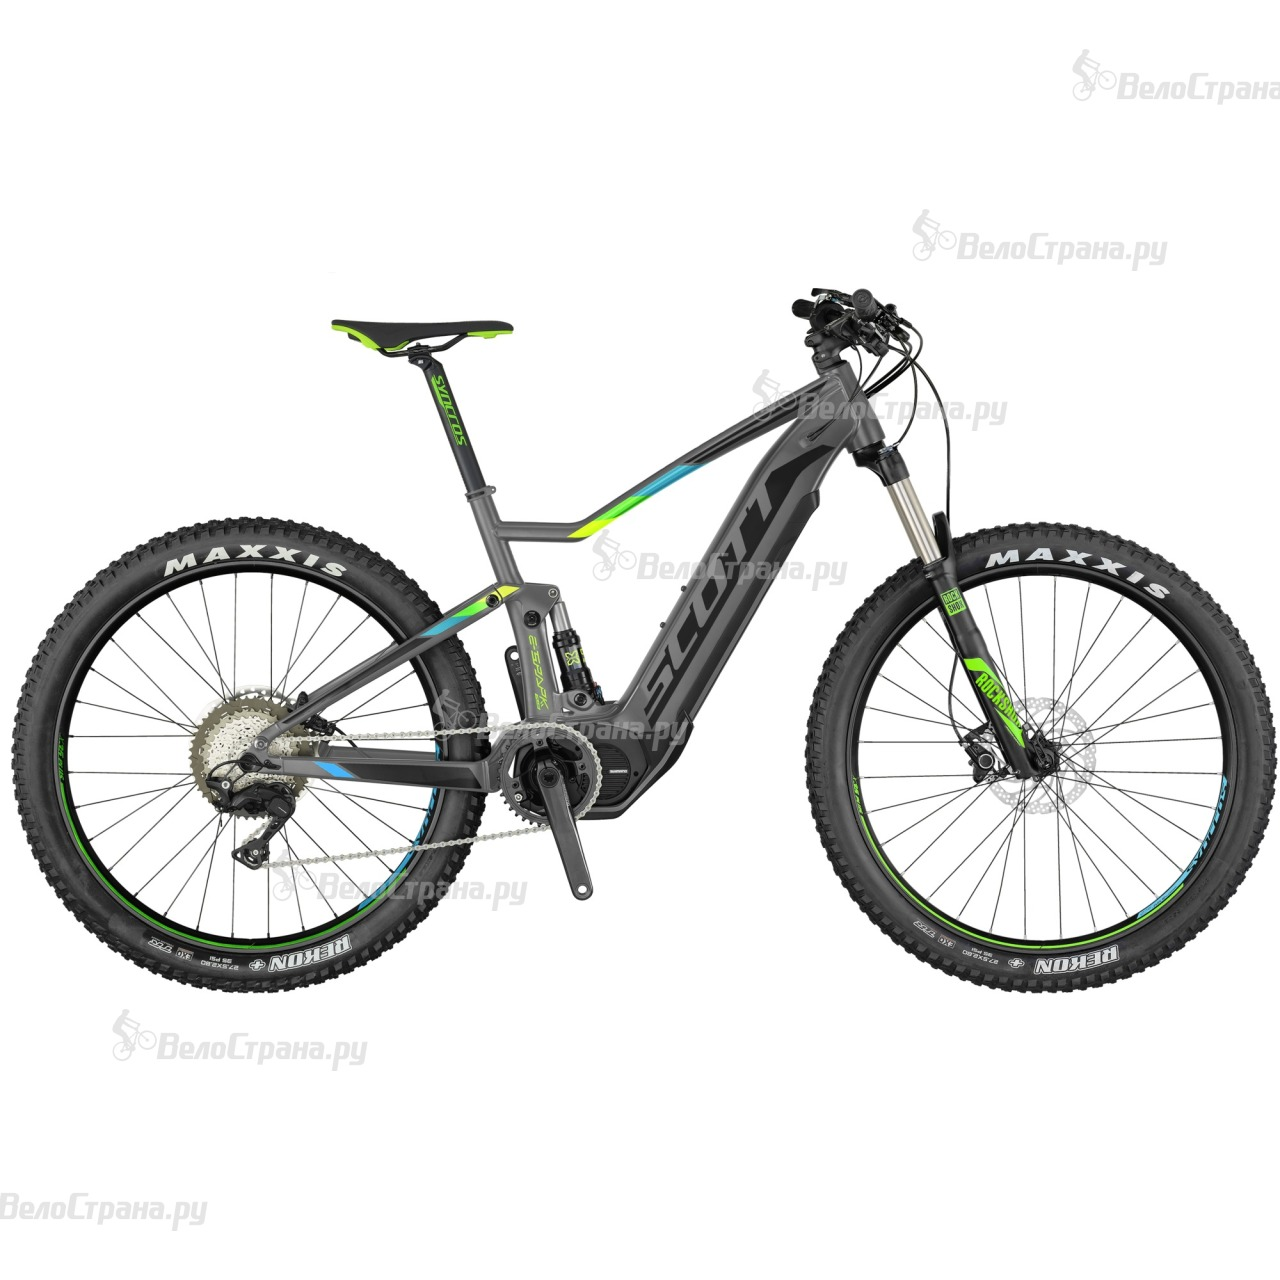 Велосипед Scott E-Spark 720 Plus (2017)